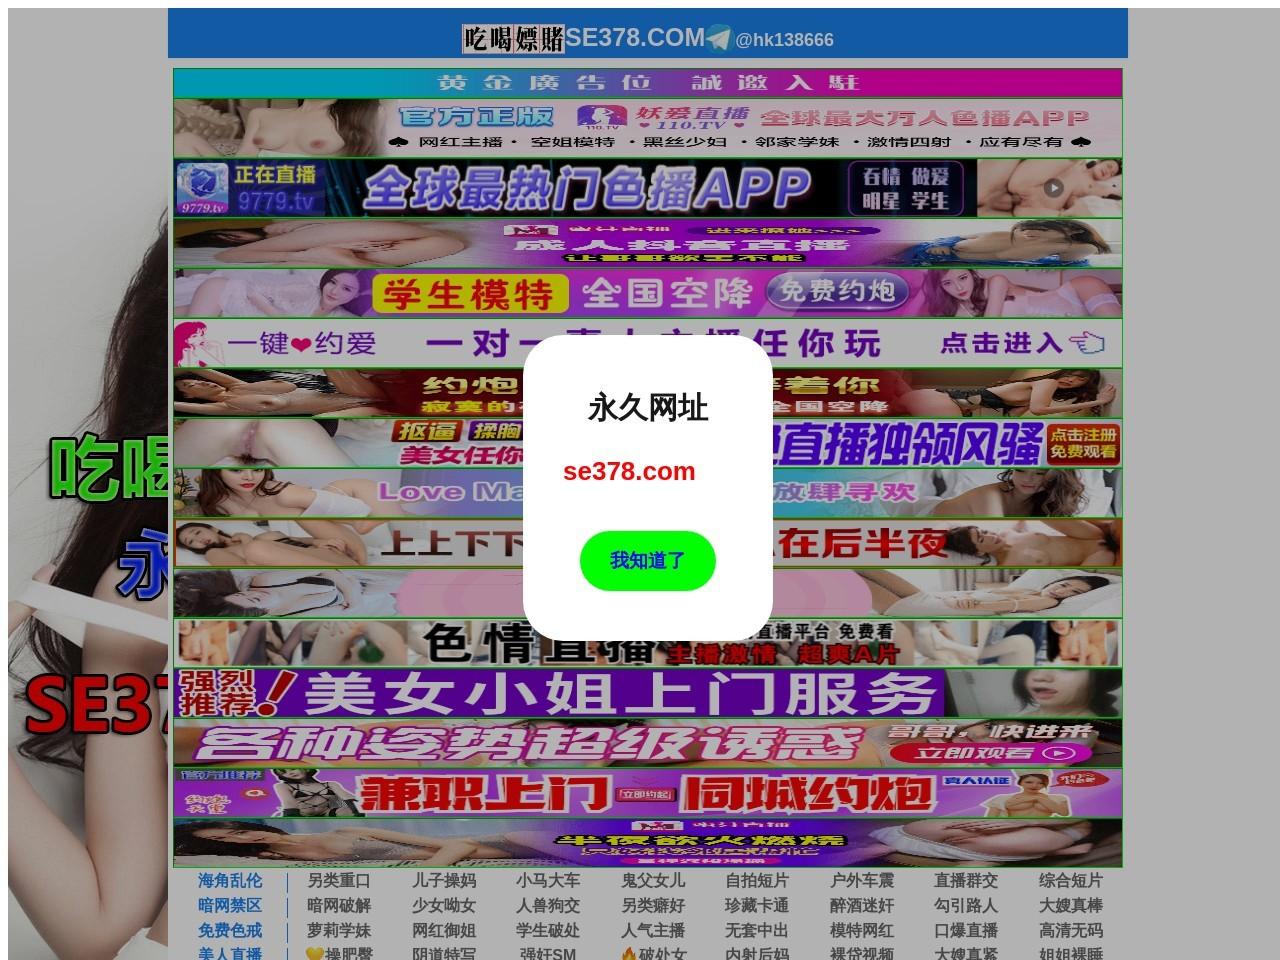 Hentai Tube: Anime Porn Videos, XXX Cartoon Clips, 3D Sex Movies